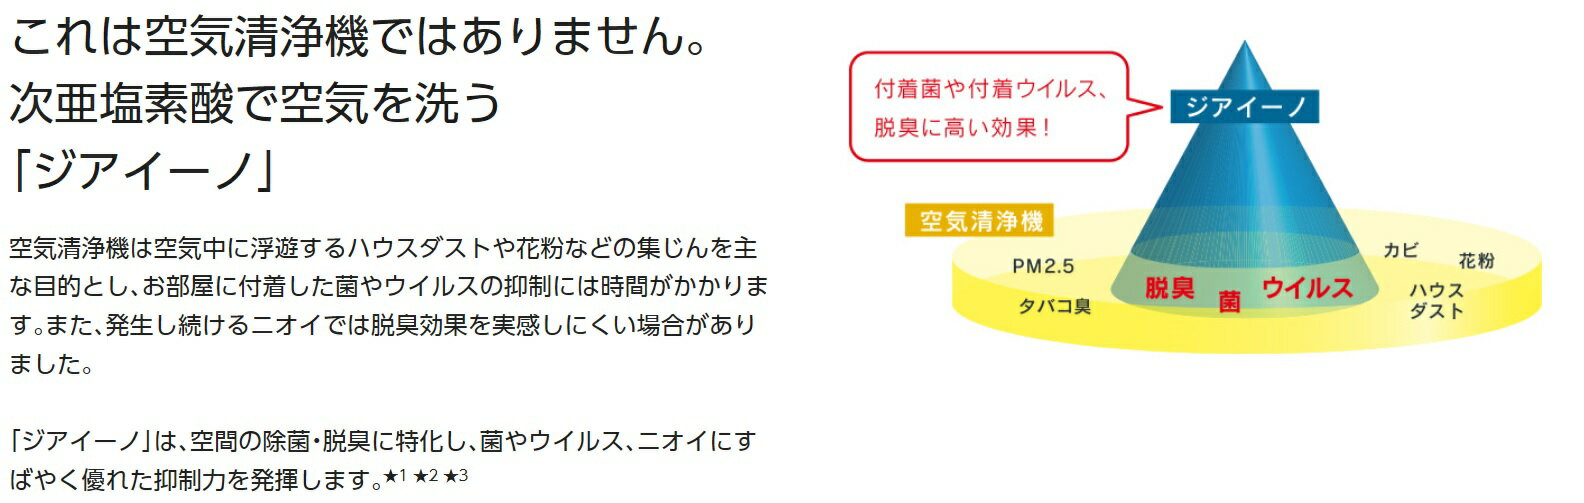 Panasonic 次亜塩素酸 空間除菌脱臭機 ジアイーノF-MV1500-WZ ~10畳迄。*沖縄、離島、一部地域は別途送料かかります。